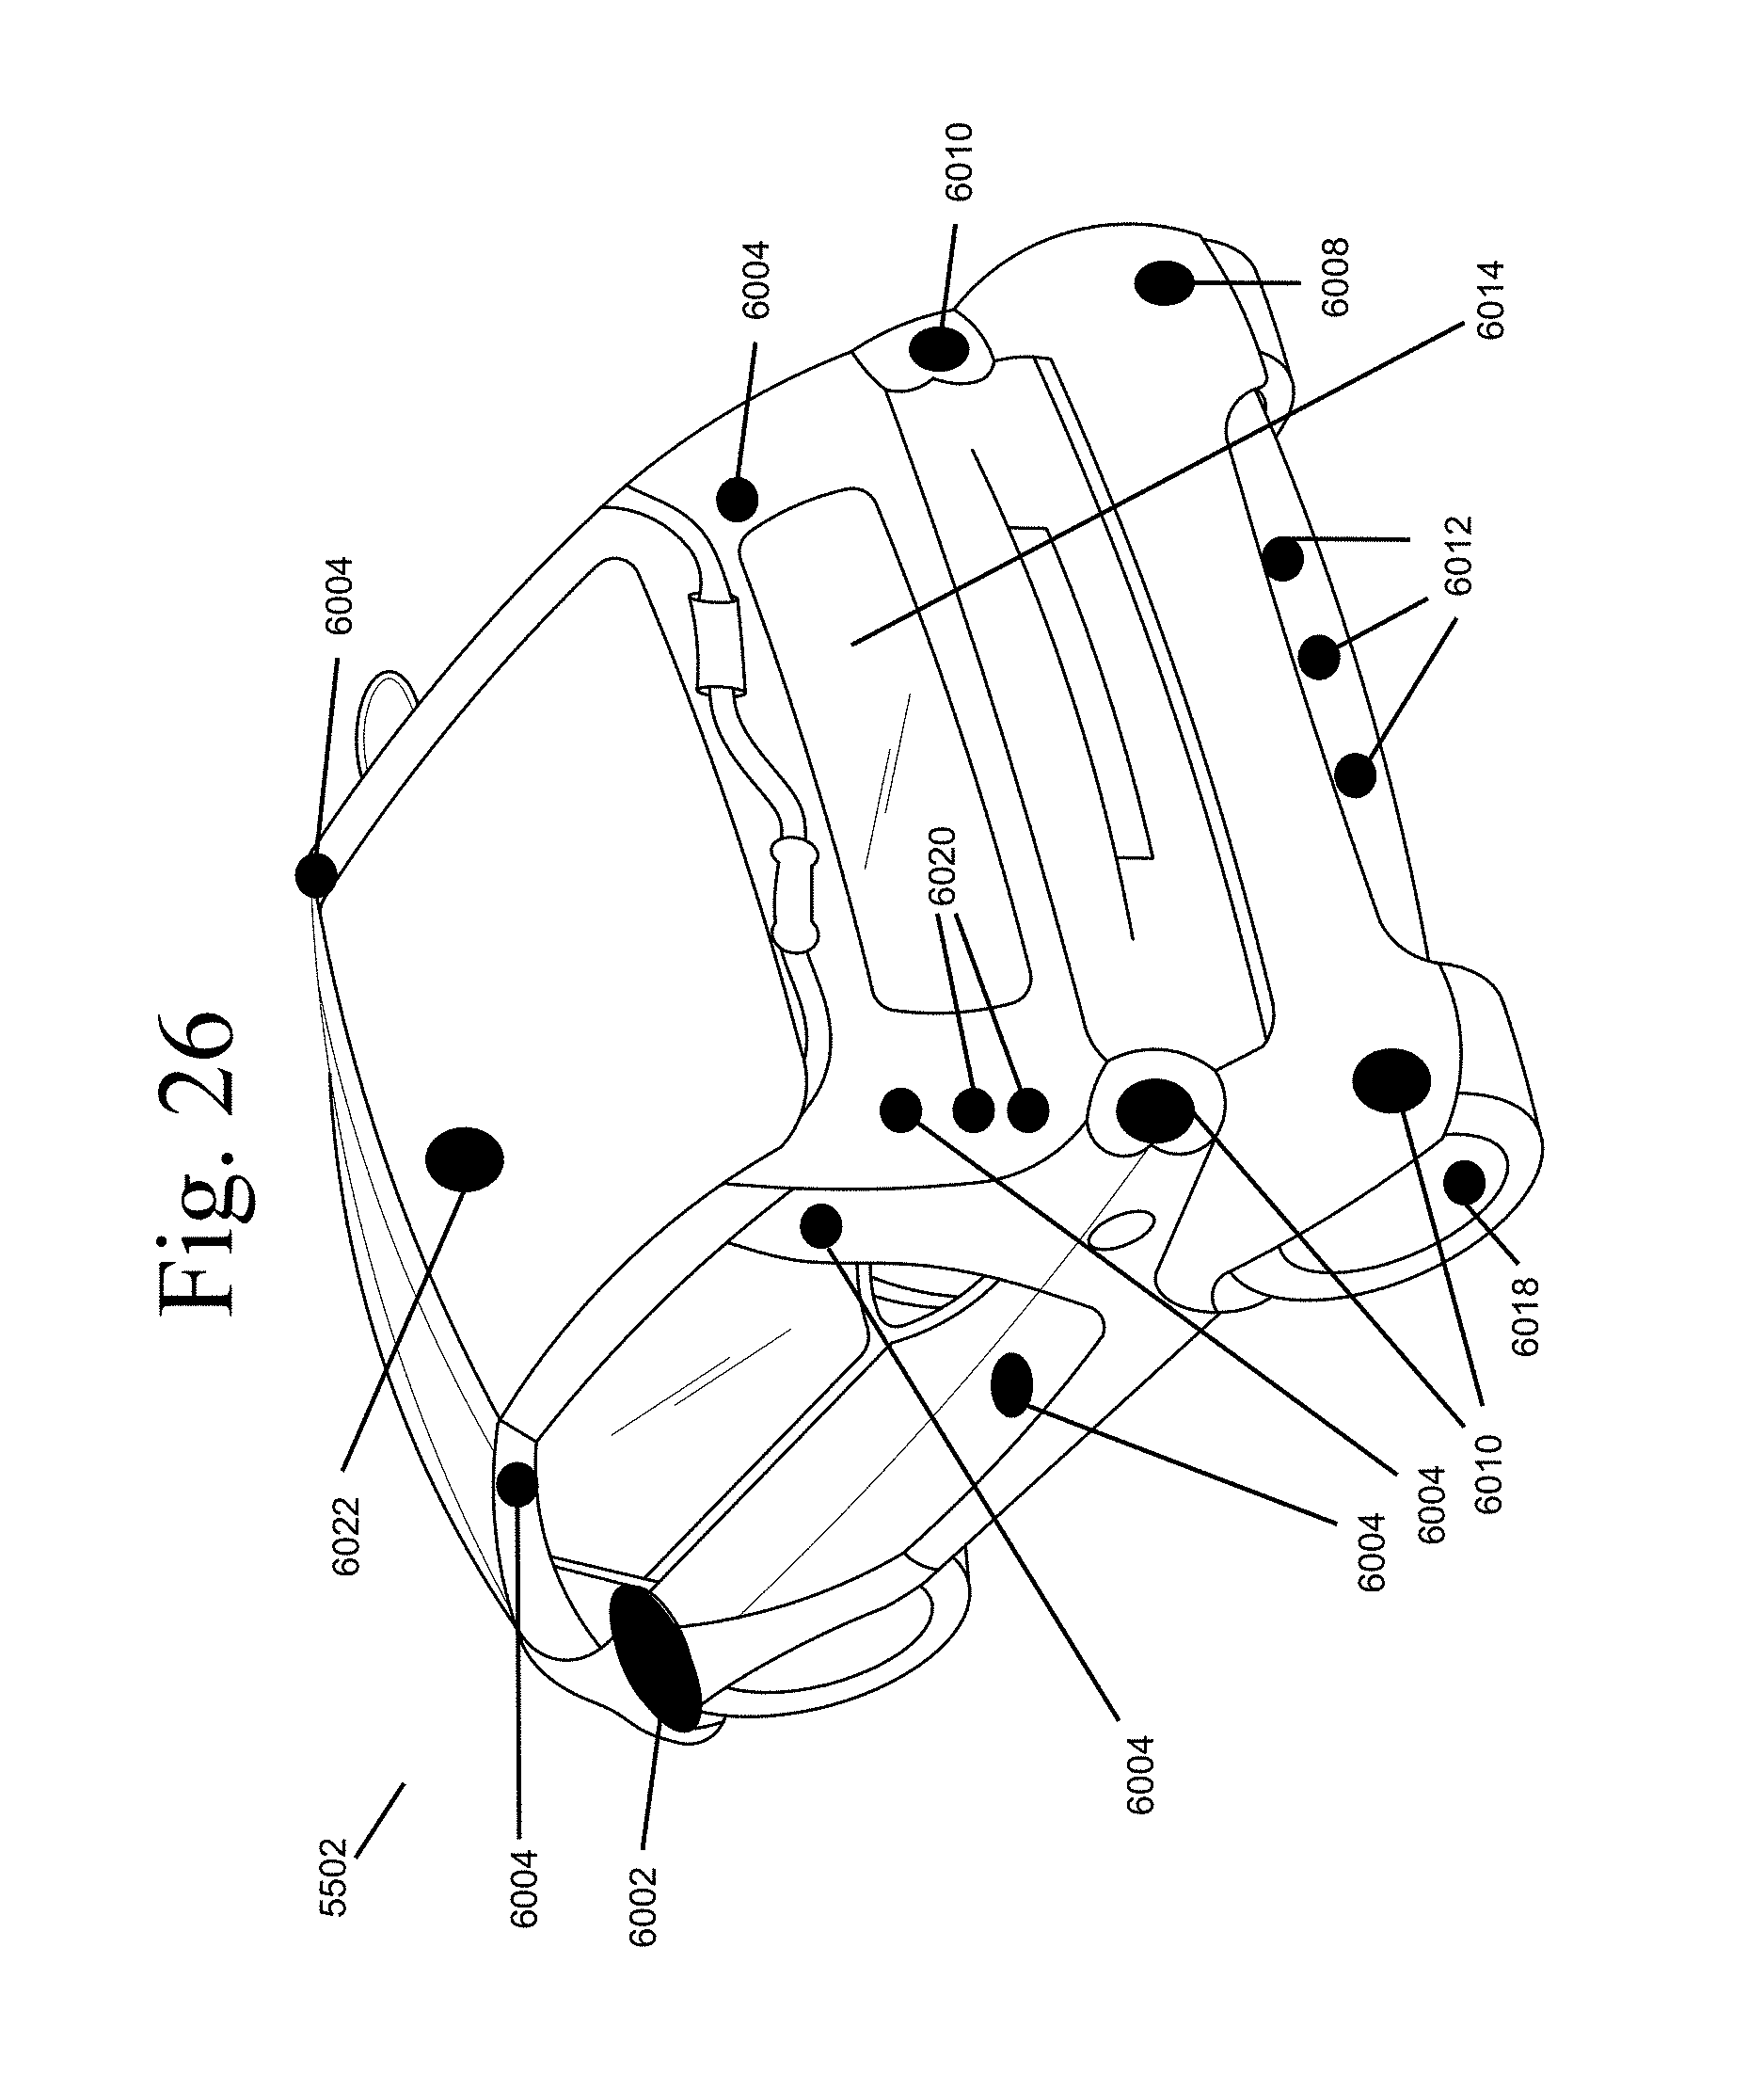 patent us 9 744 858 b2 HVAC Wiring Diagrams patent images